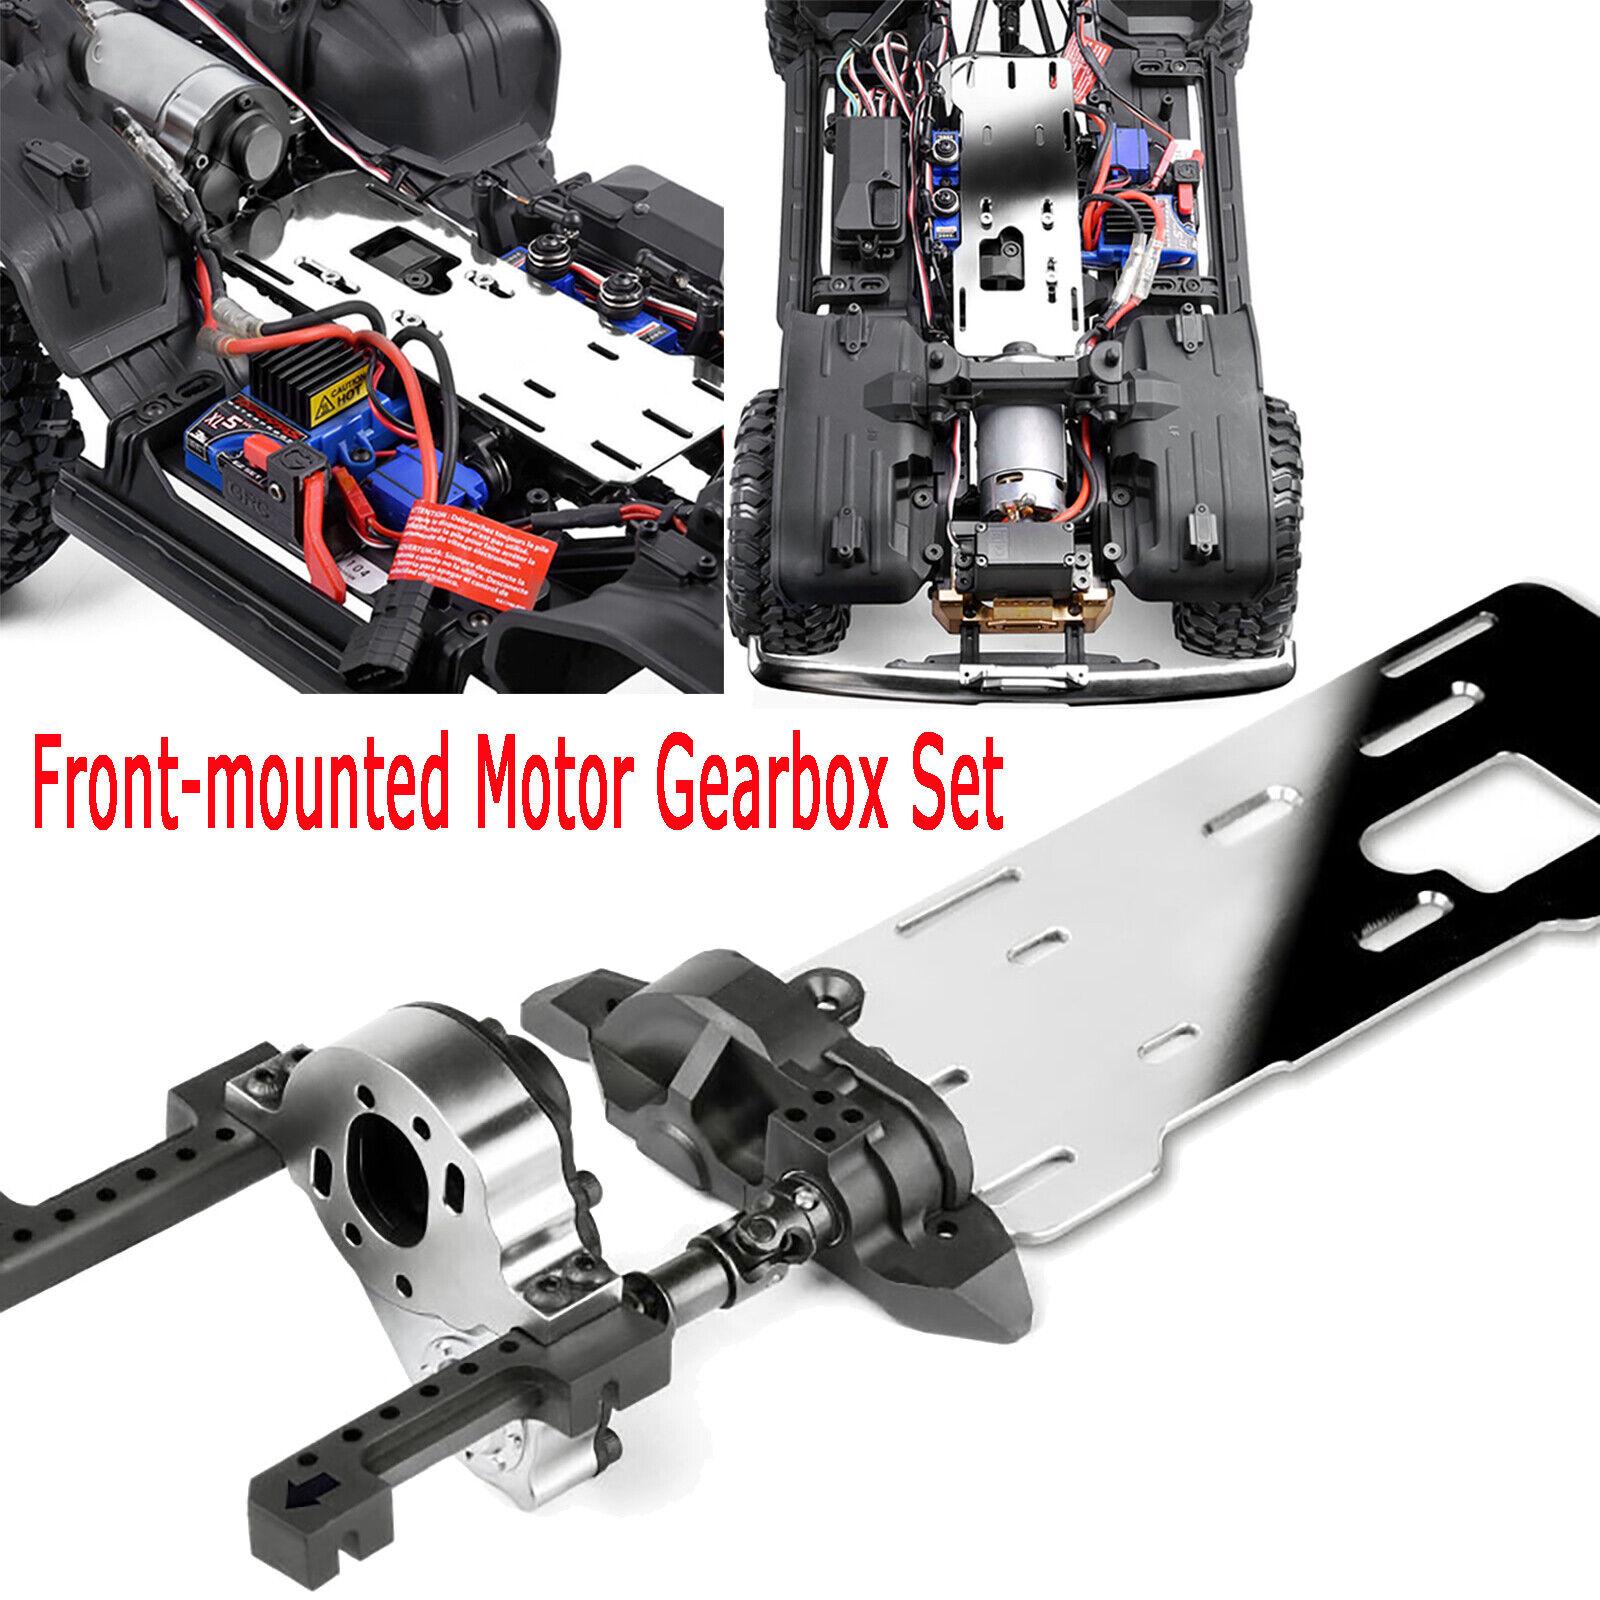 GRC TRX4 G2 montaje FRONTAL MOTOR Motor Caja De Cambios Kit Para TRAXXAS TRX-4 RC GAX0033S